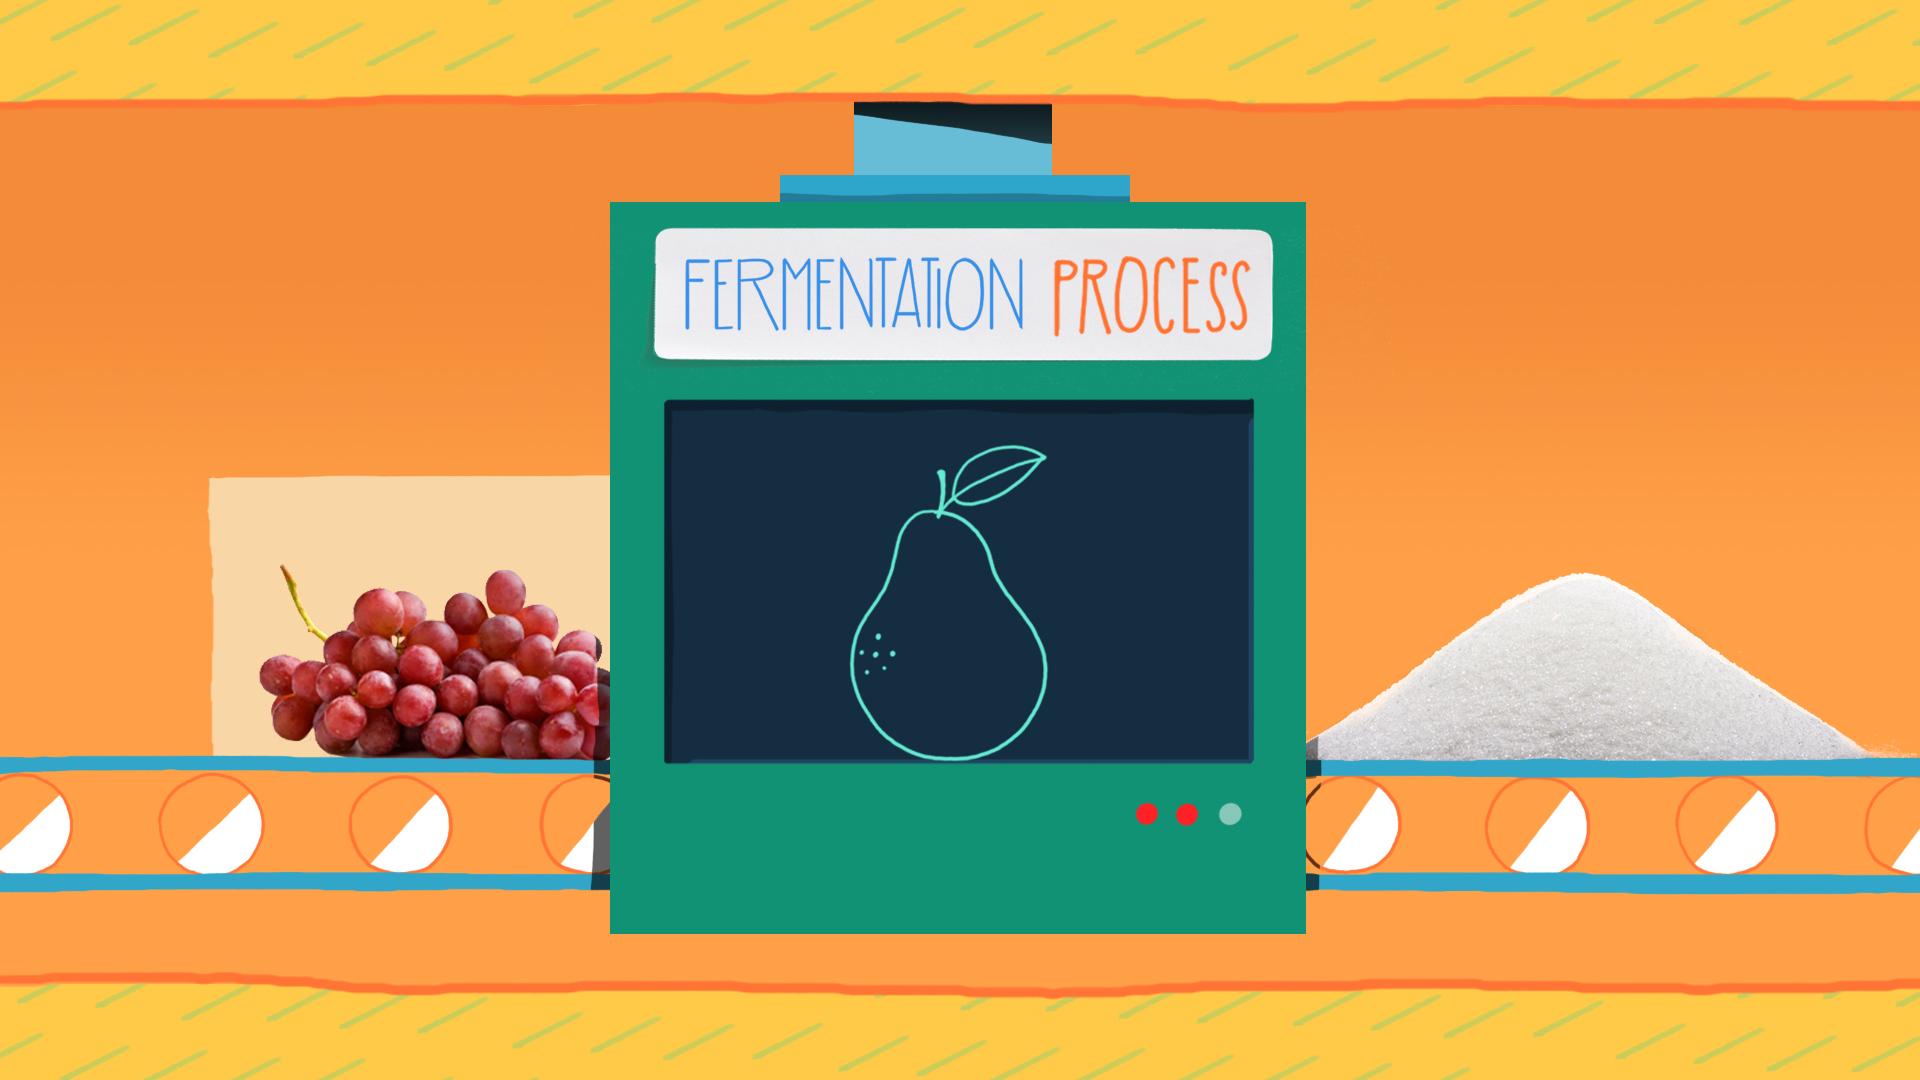 18_Fermentation_tc.jpg